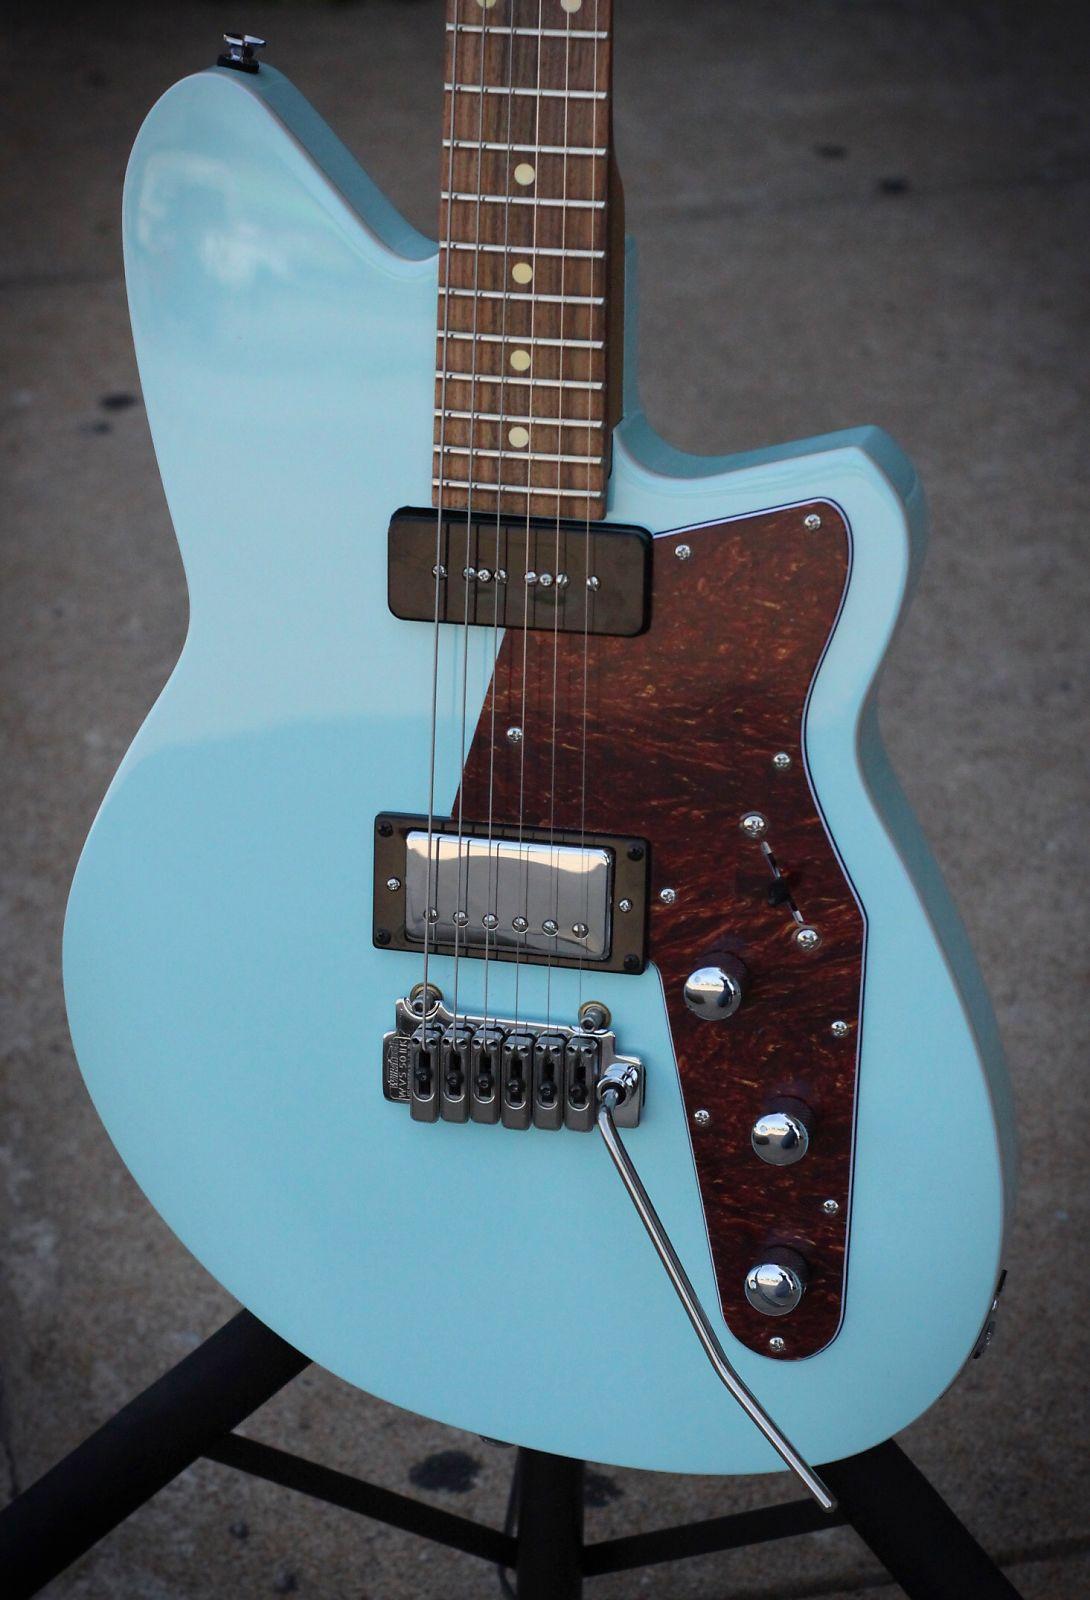 13f4026abb Reverend Guitars - Double Agent W with Pau Ferro fretboard - Chronic ...